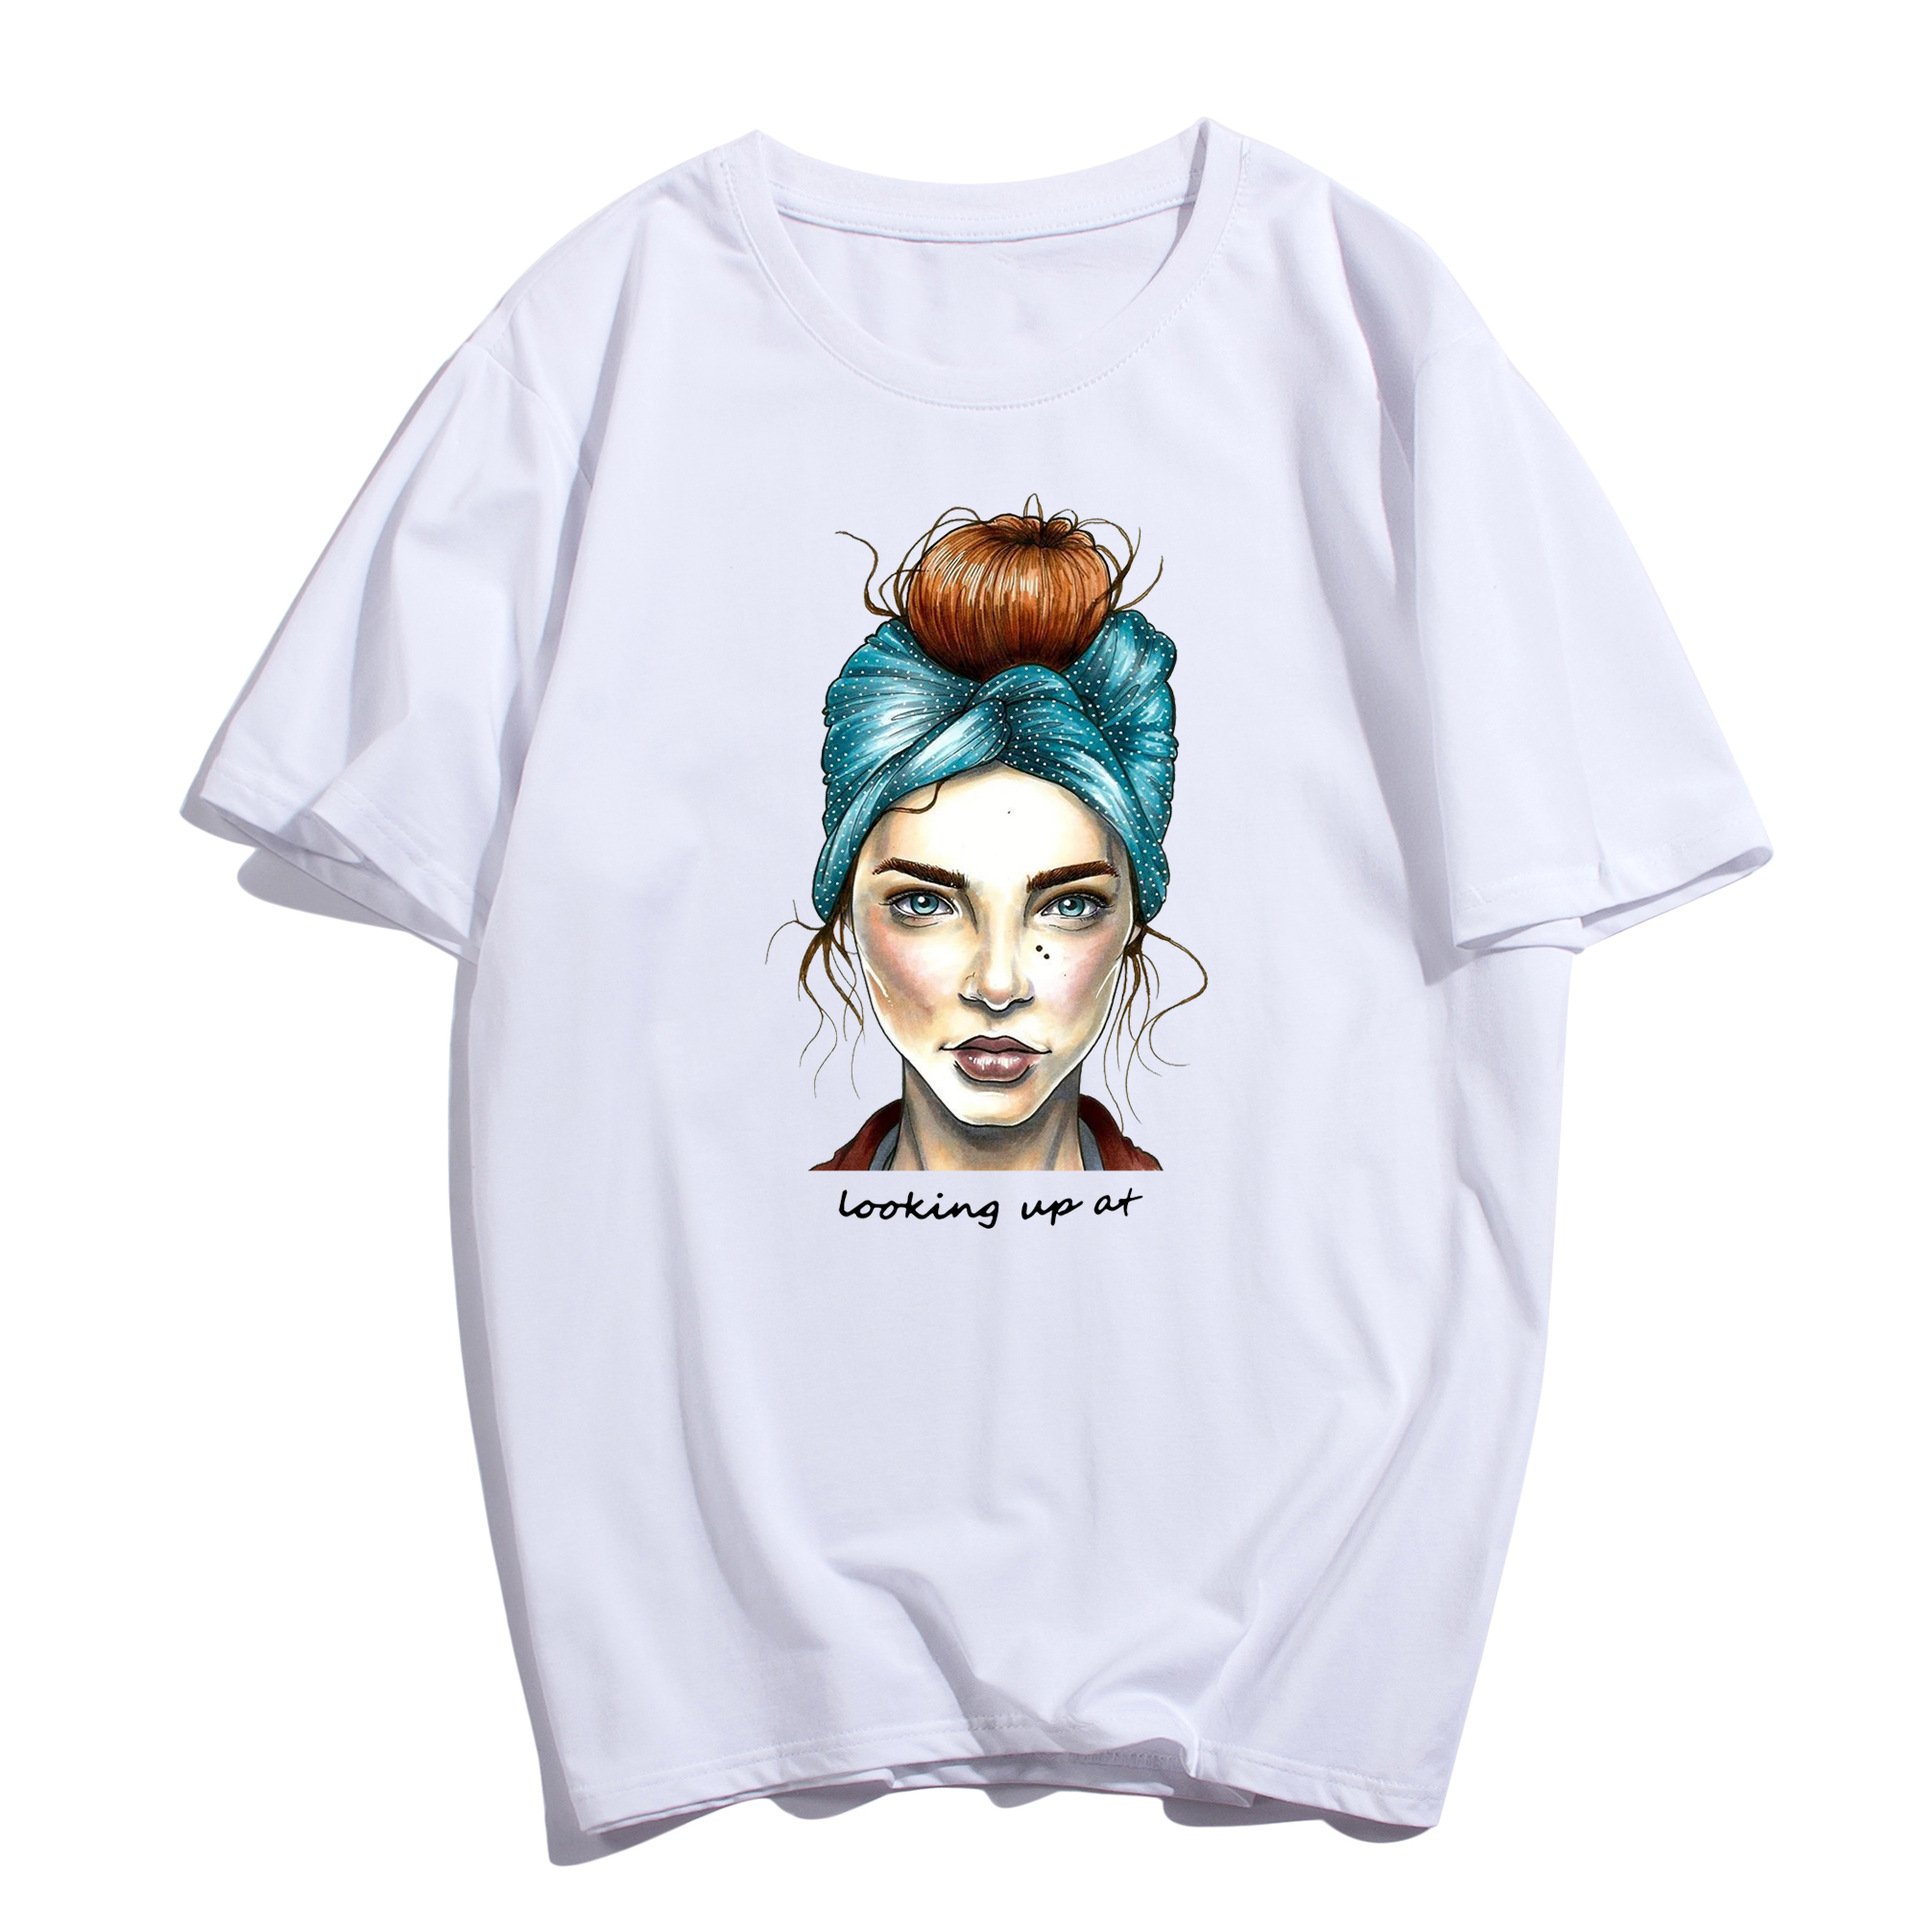 2019 Fashion Cool Print Female T shirt White Cotton Women Tshirts Summer Casual Harajuku T Shirt Femme Top Plus Size XS 4XL in T Shirts from Women 39 s Clothing